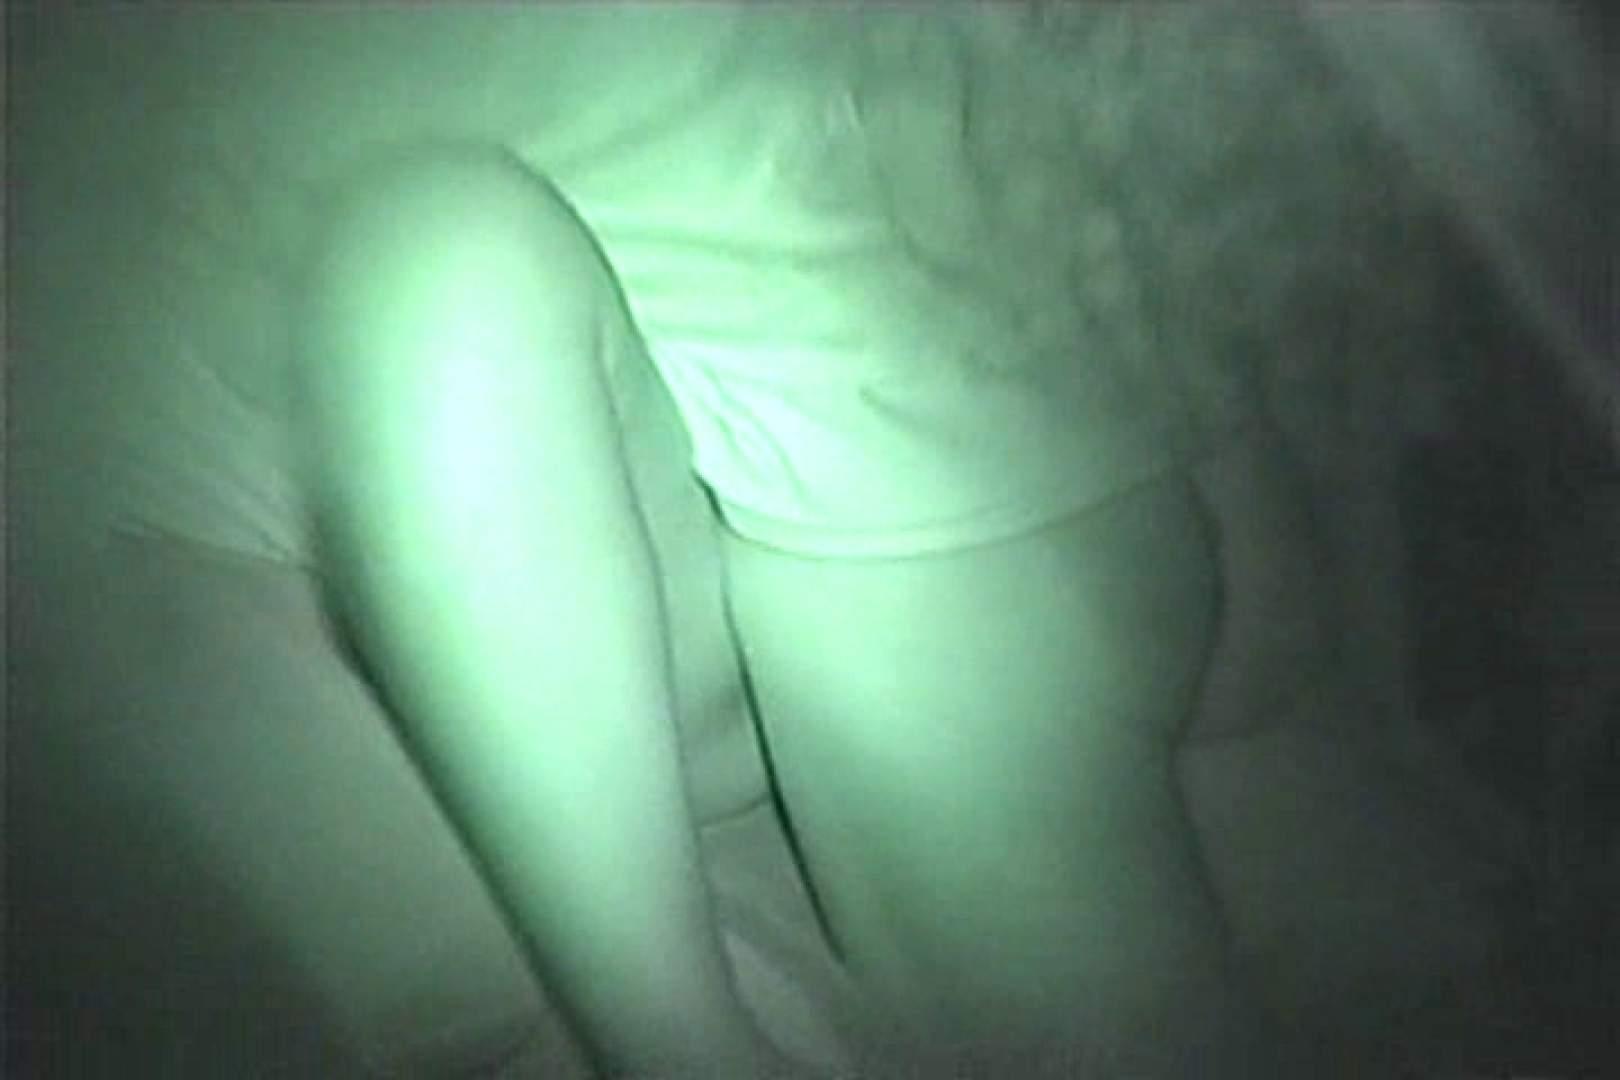 MASAさんの待ち伏せ撮り! 赤外線カーセックスVol.17 美しいOLの裸体 盗撮動画紹介 70pic 11